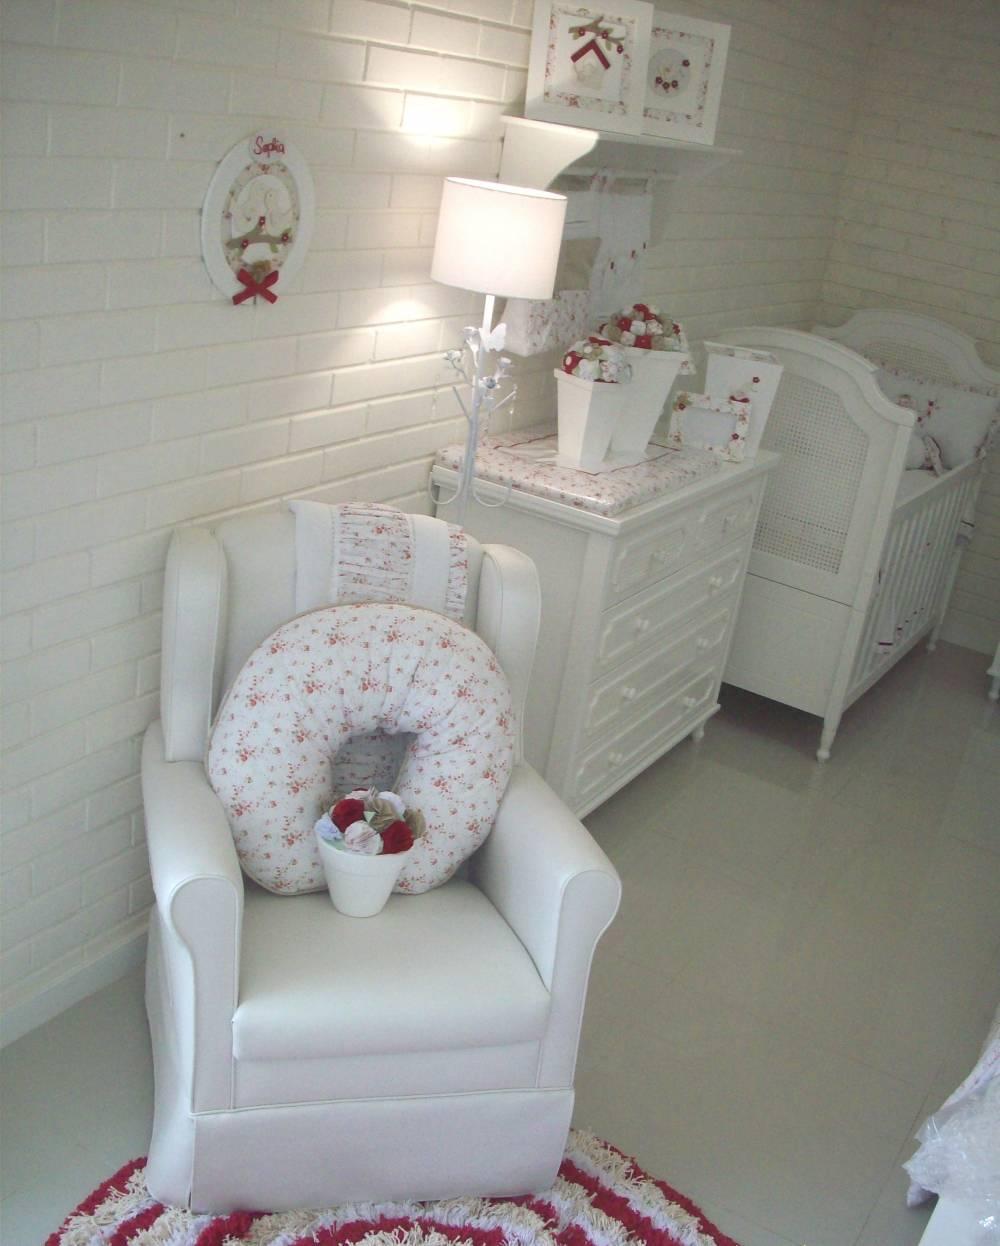 Lojas de Enxoval de Bebê na Vila Medeiros - Loja de Enxoval de Bebê